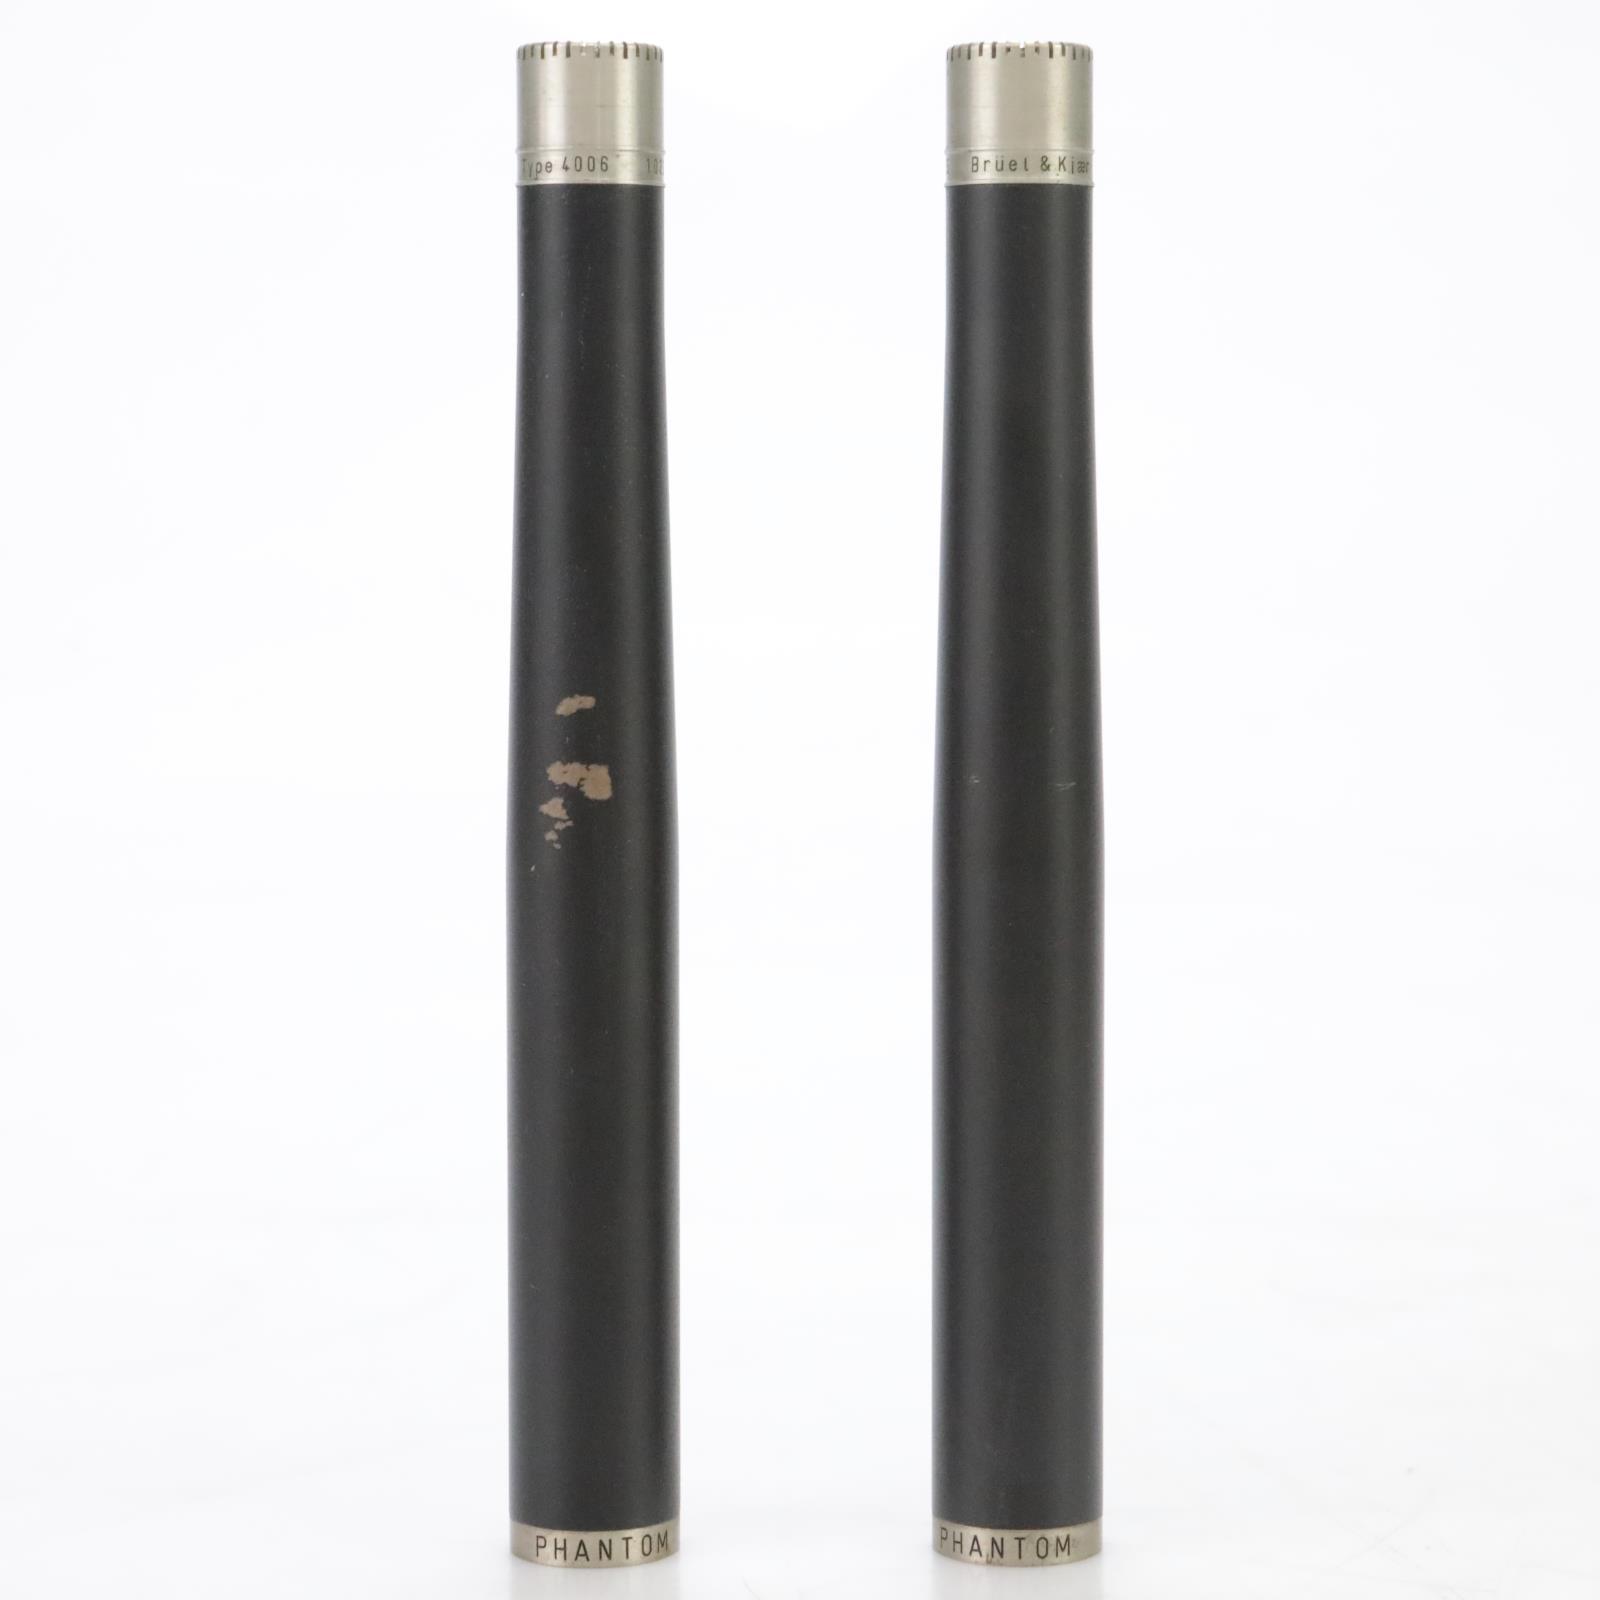 2 Bruel & Kjaer 4006 Omnidirectional Condenser Microphones w/ Cases #45054